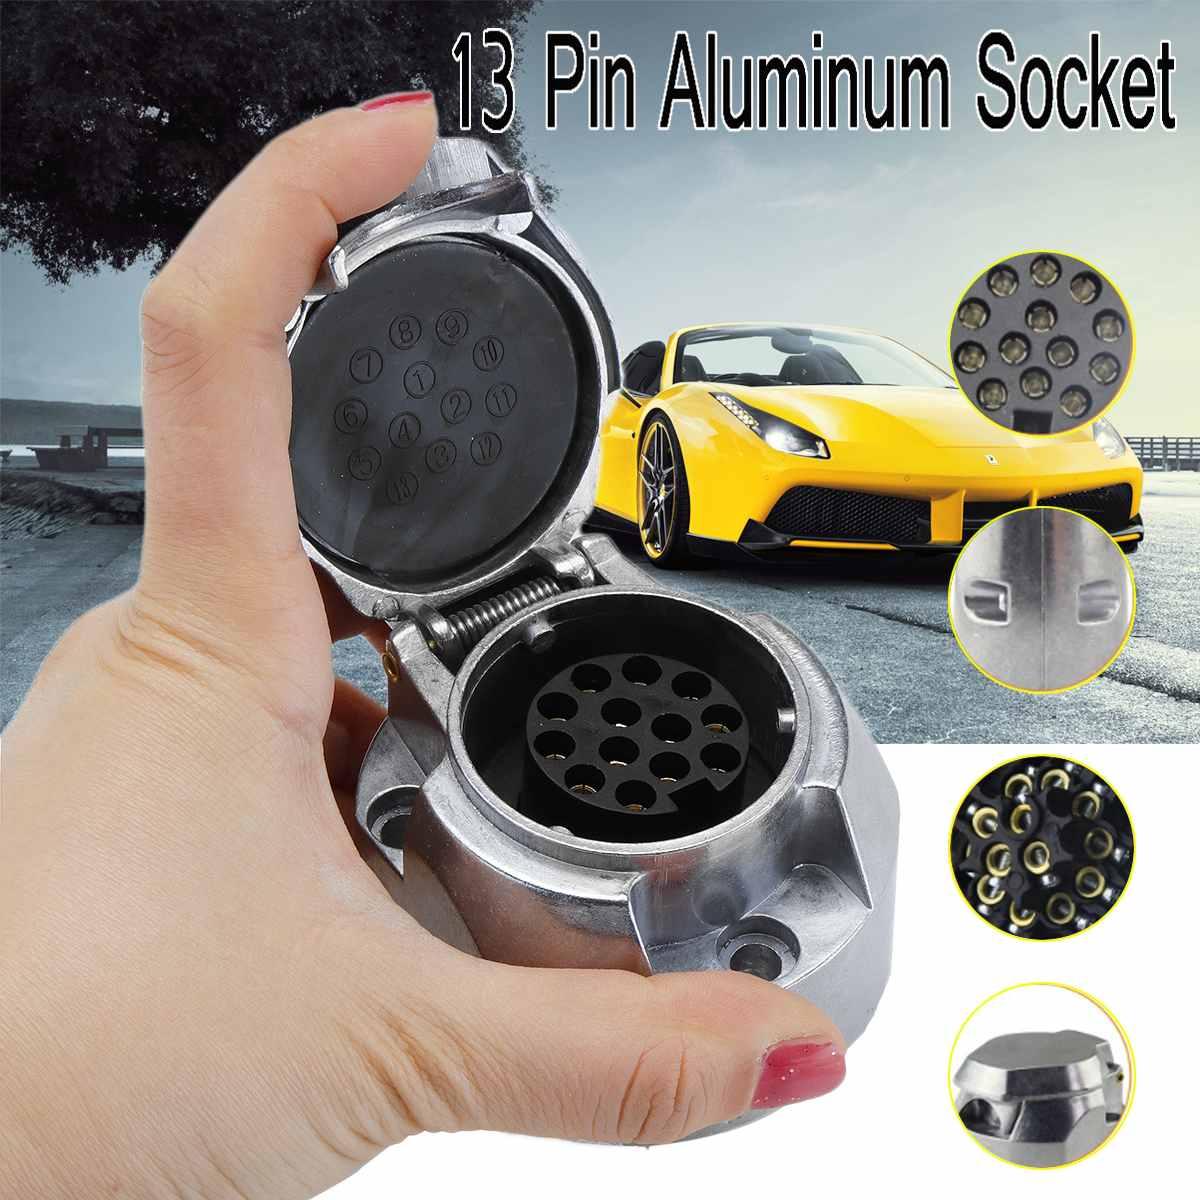 13 Pin European Standard Trailer Socket Aluminum Trailer Socket 12V Towbar Towing Socket For Car Trailer Ship RV